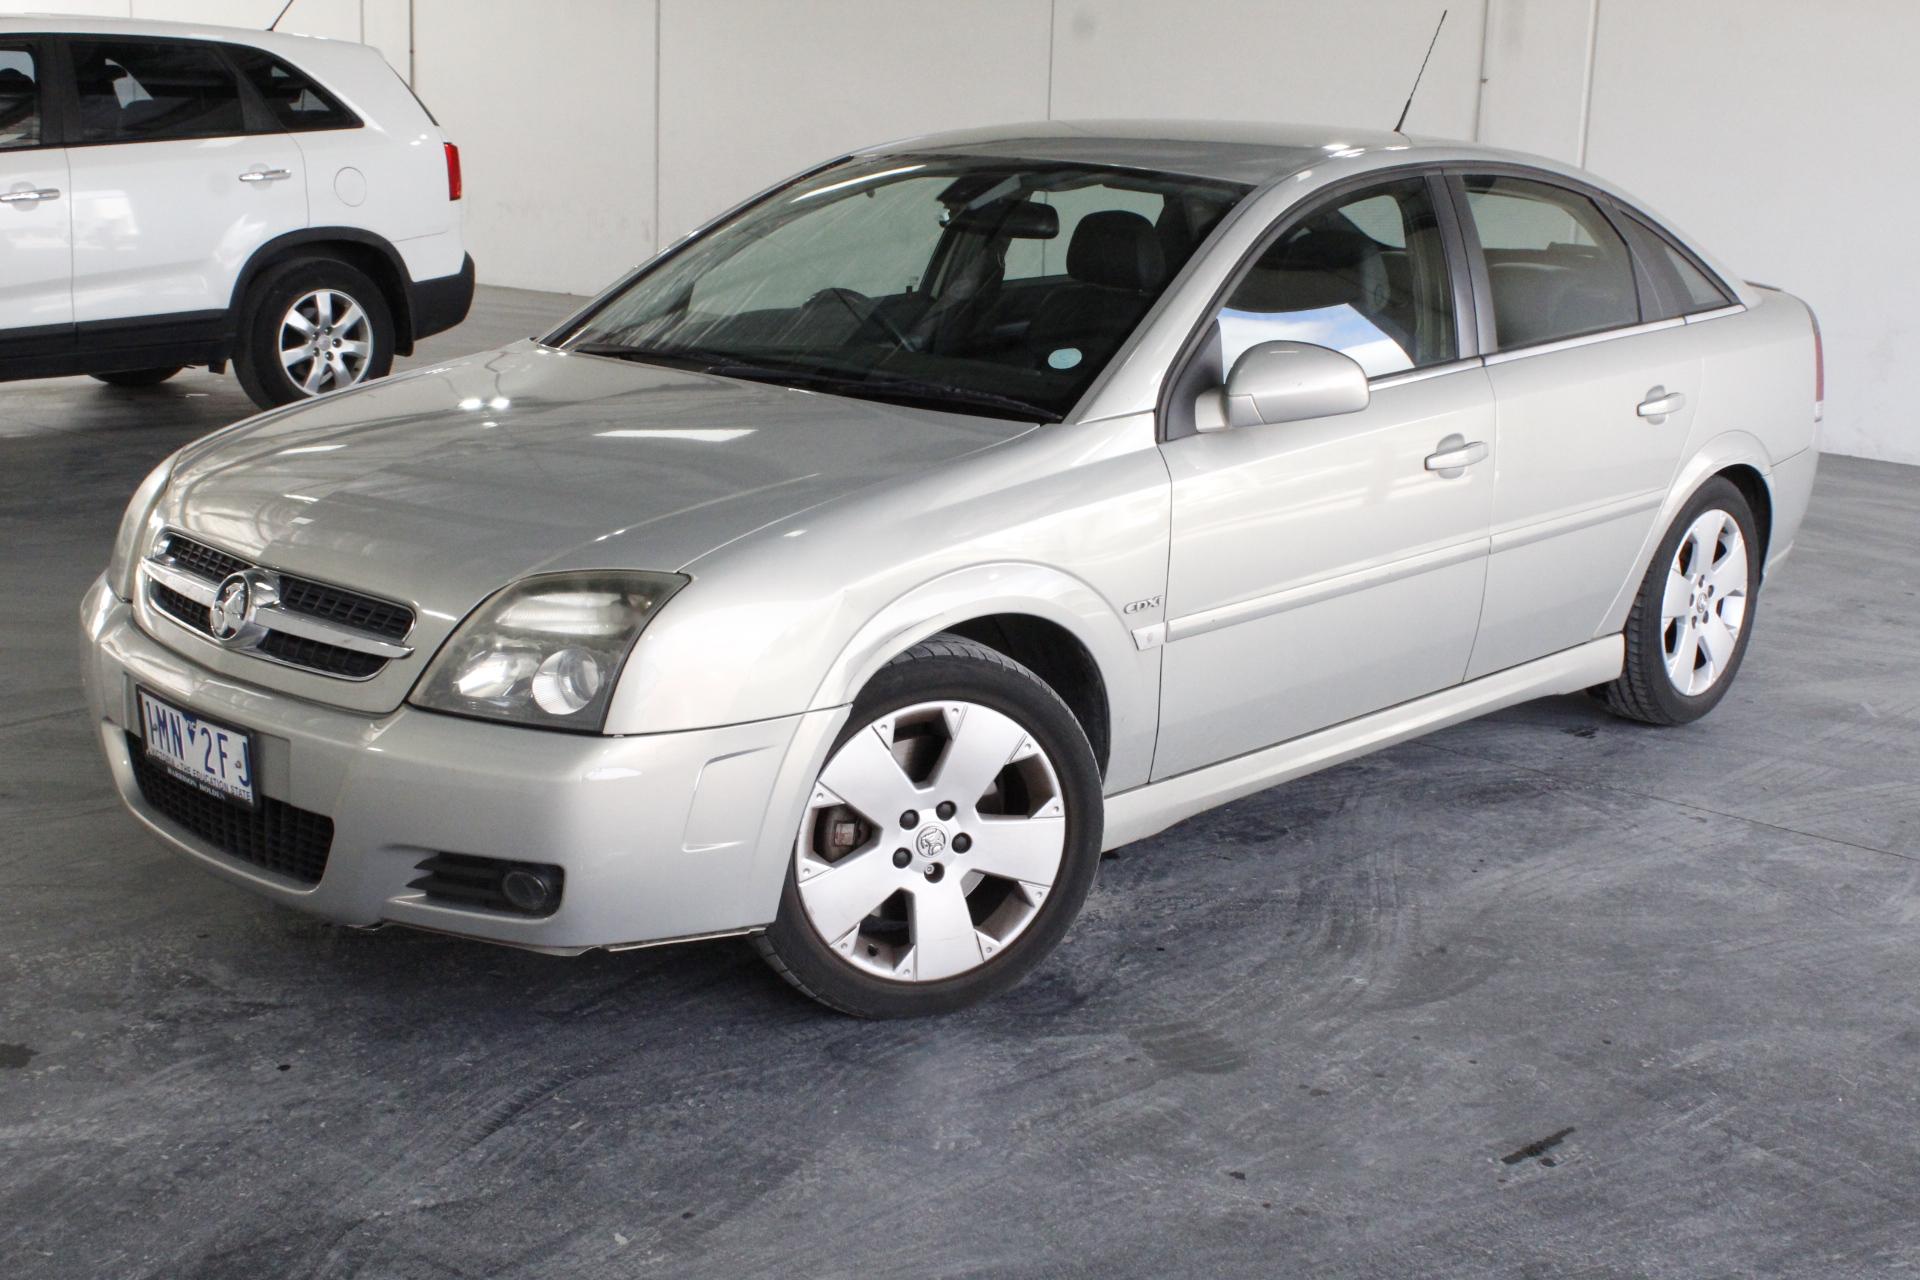 2005 Holden Vectra CDXi ZC Automatic Hatchback